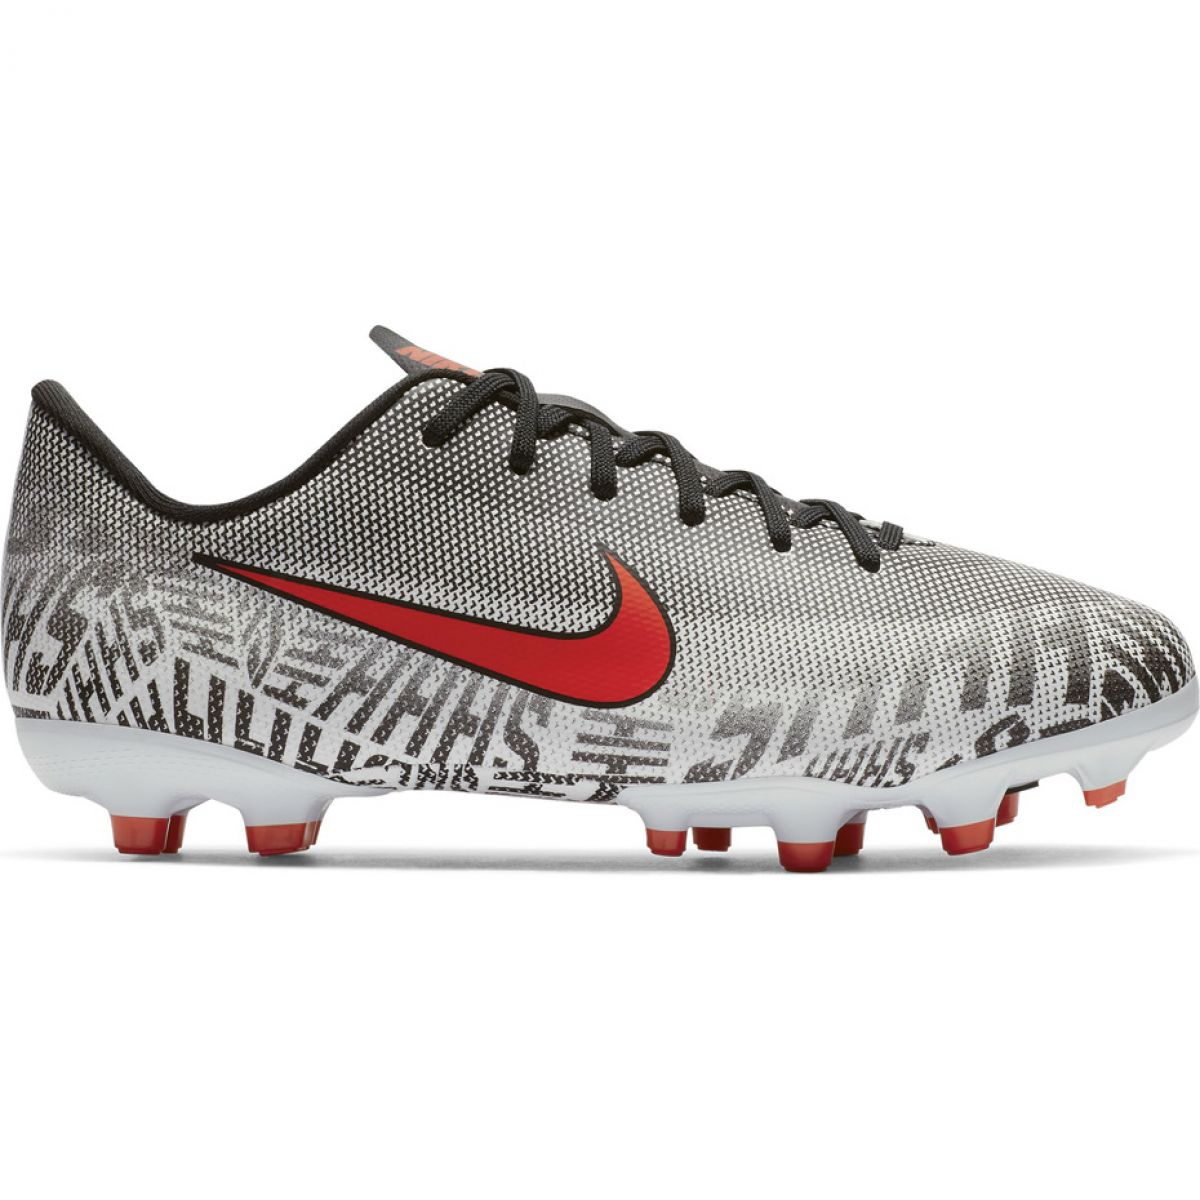 170 Vapor De Nike 12 Ao2896 Mercurial Football Mg Fg Neymar Jr Chaussures Academy jL4AR5